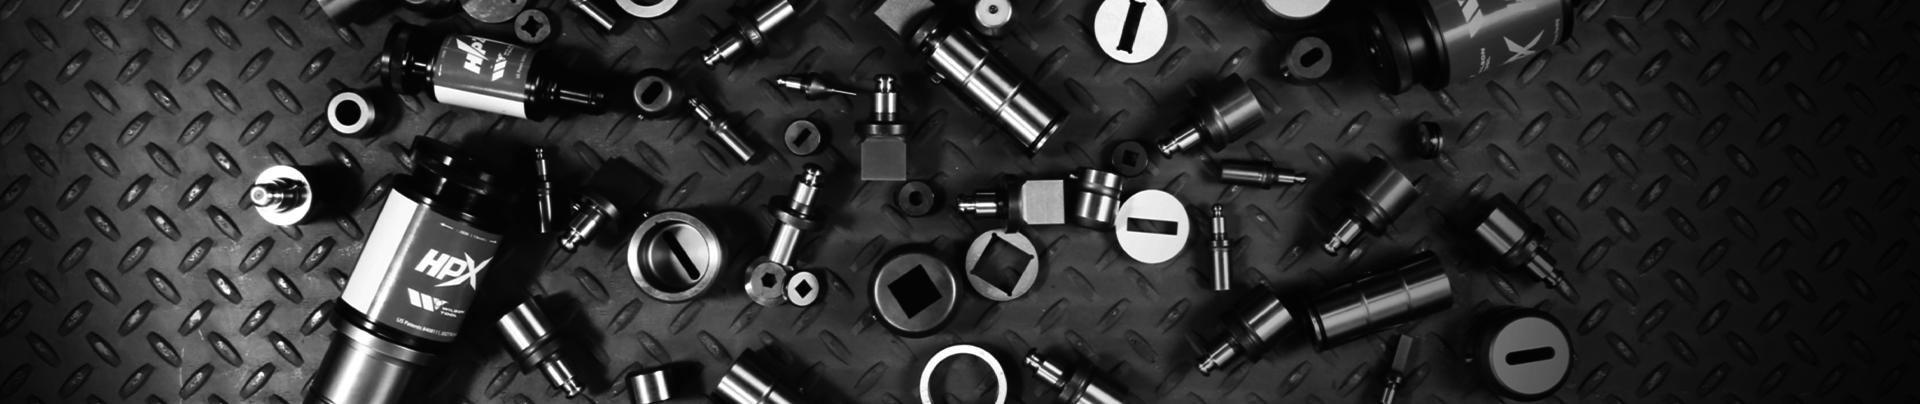 Punch Tooling NZ | Home | Sheet Metal Fabrication Machinery